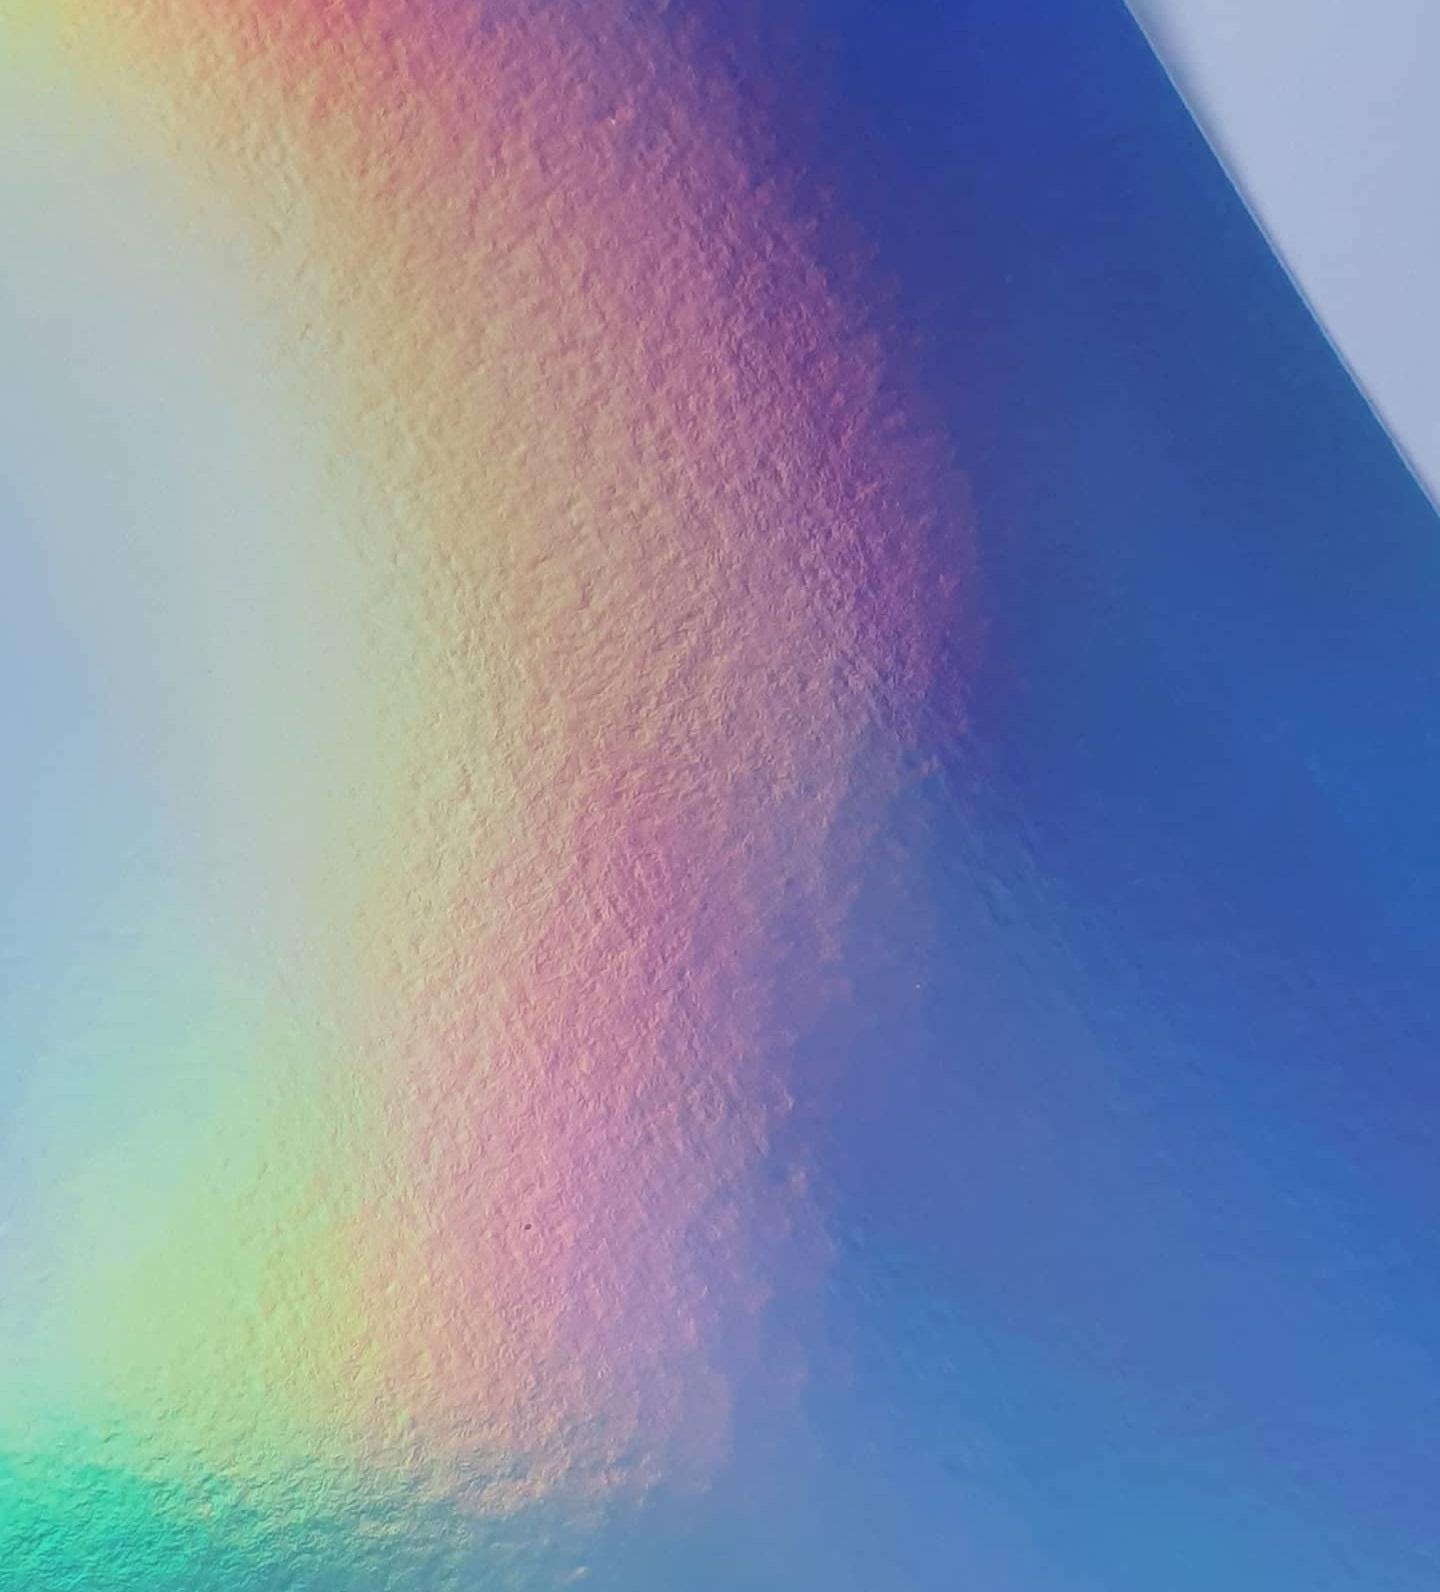 Papel Laminado Holográfico Arco-Íris 180g A4  - Minas Midias